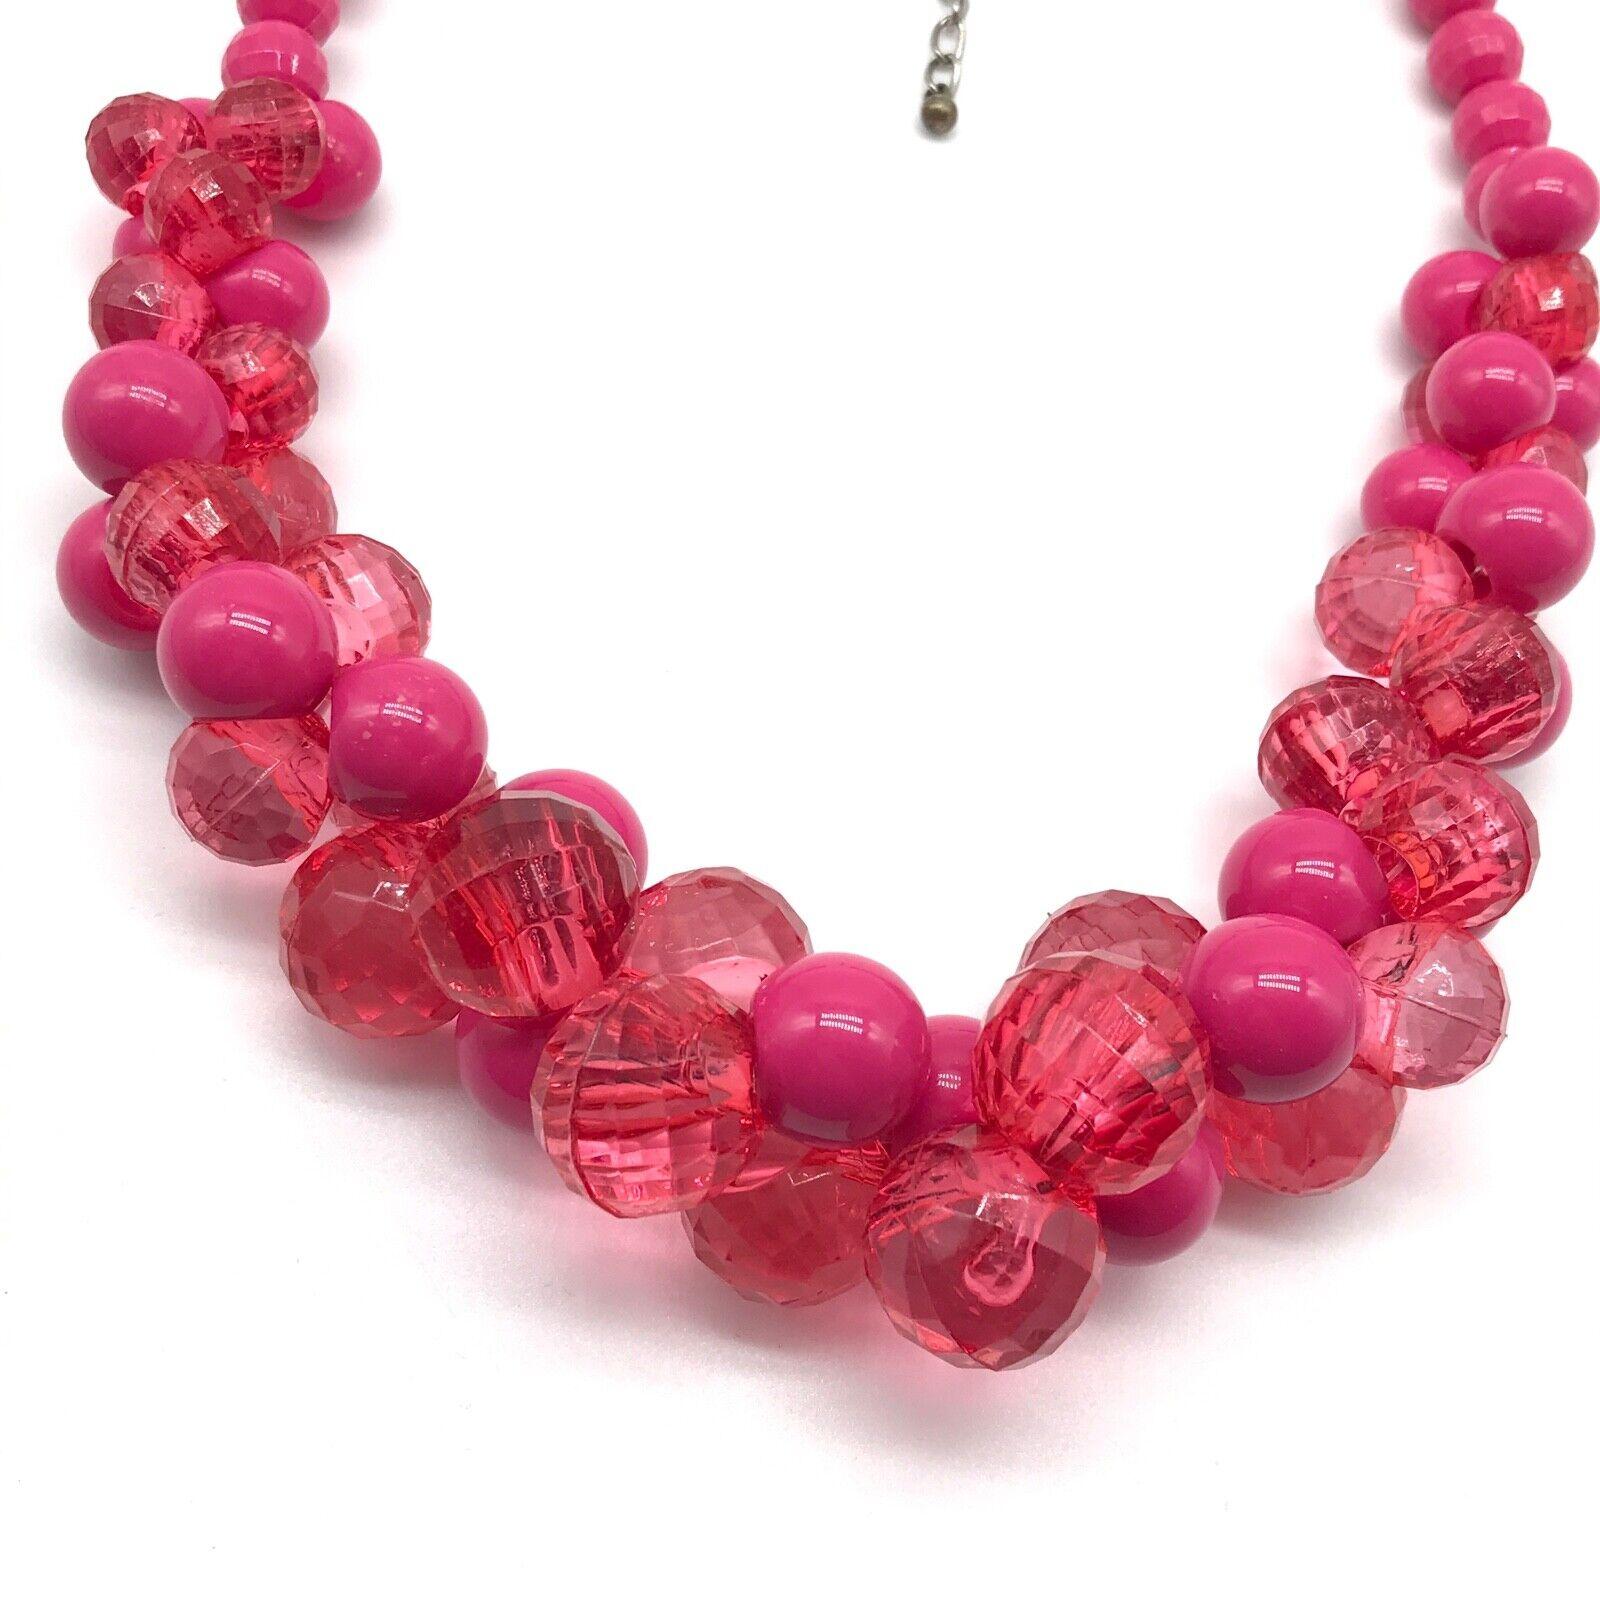 Bubblegum Pink Beaded Cluster Statement Necklace - image 2